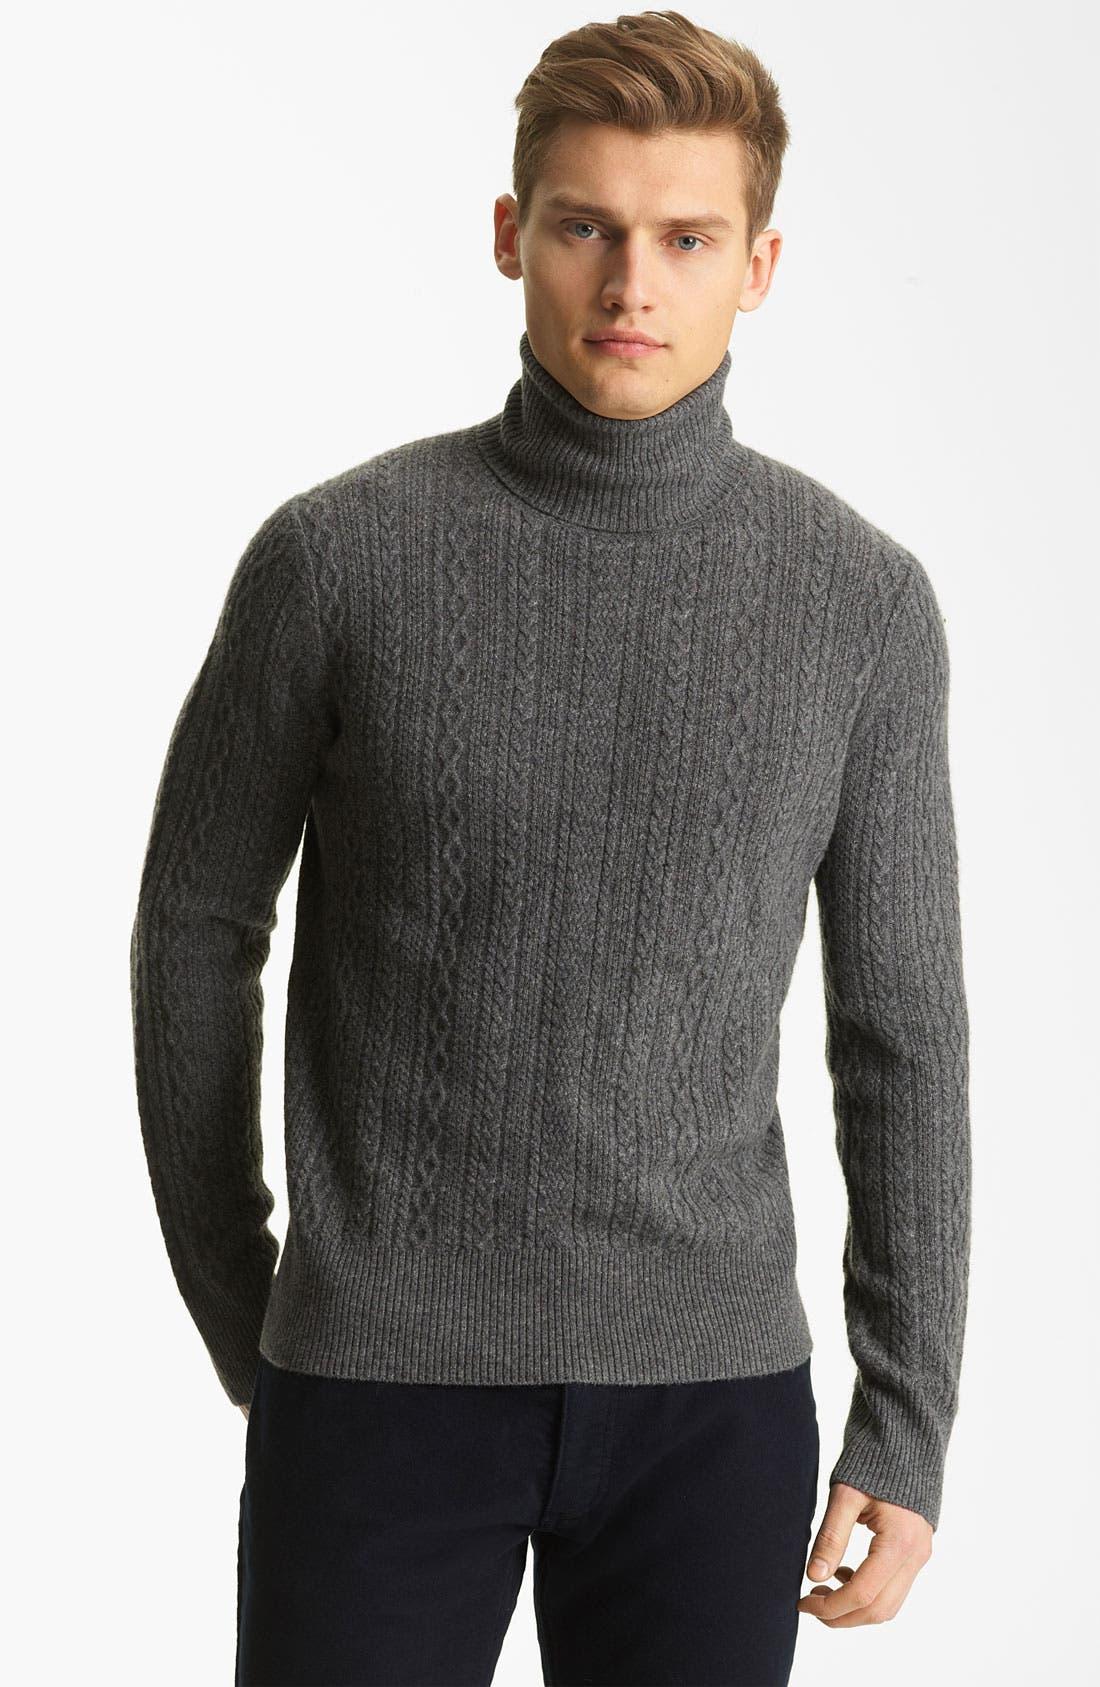 Alternate Image 1 Selected - Billy Reid 'Elton' Cashmere Turtleneck Sweater